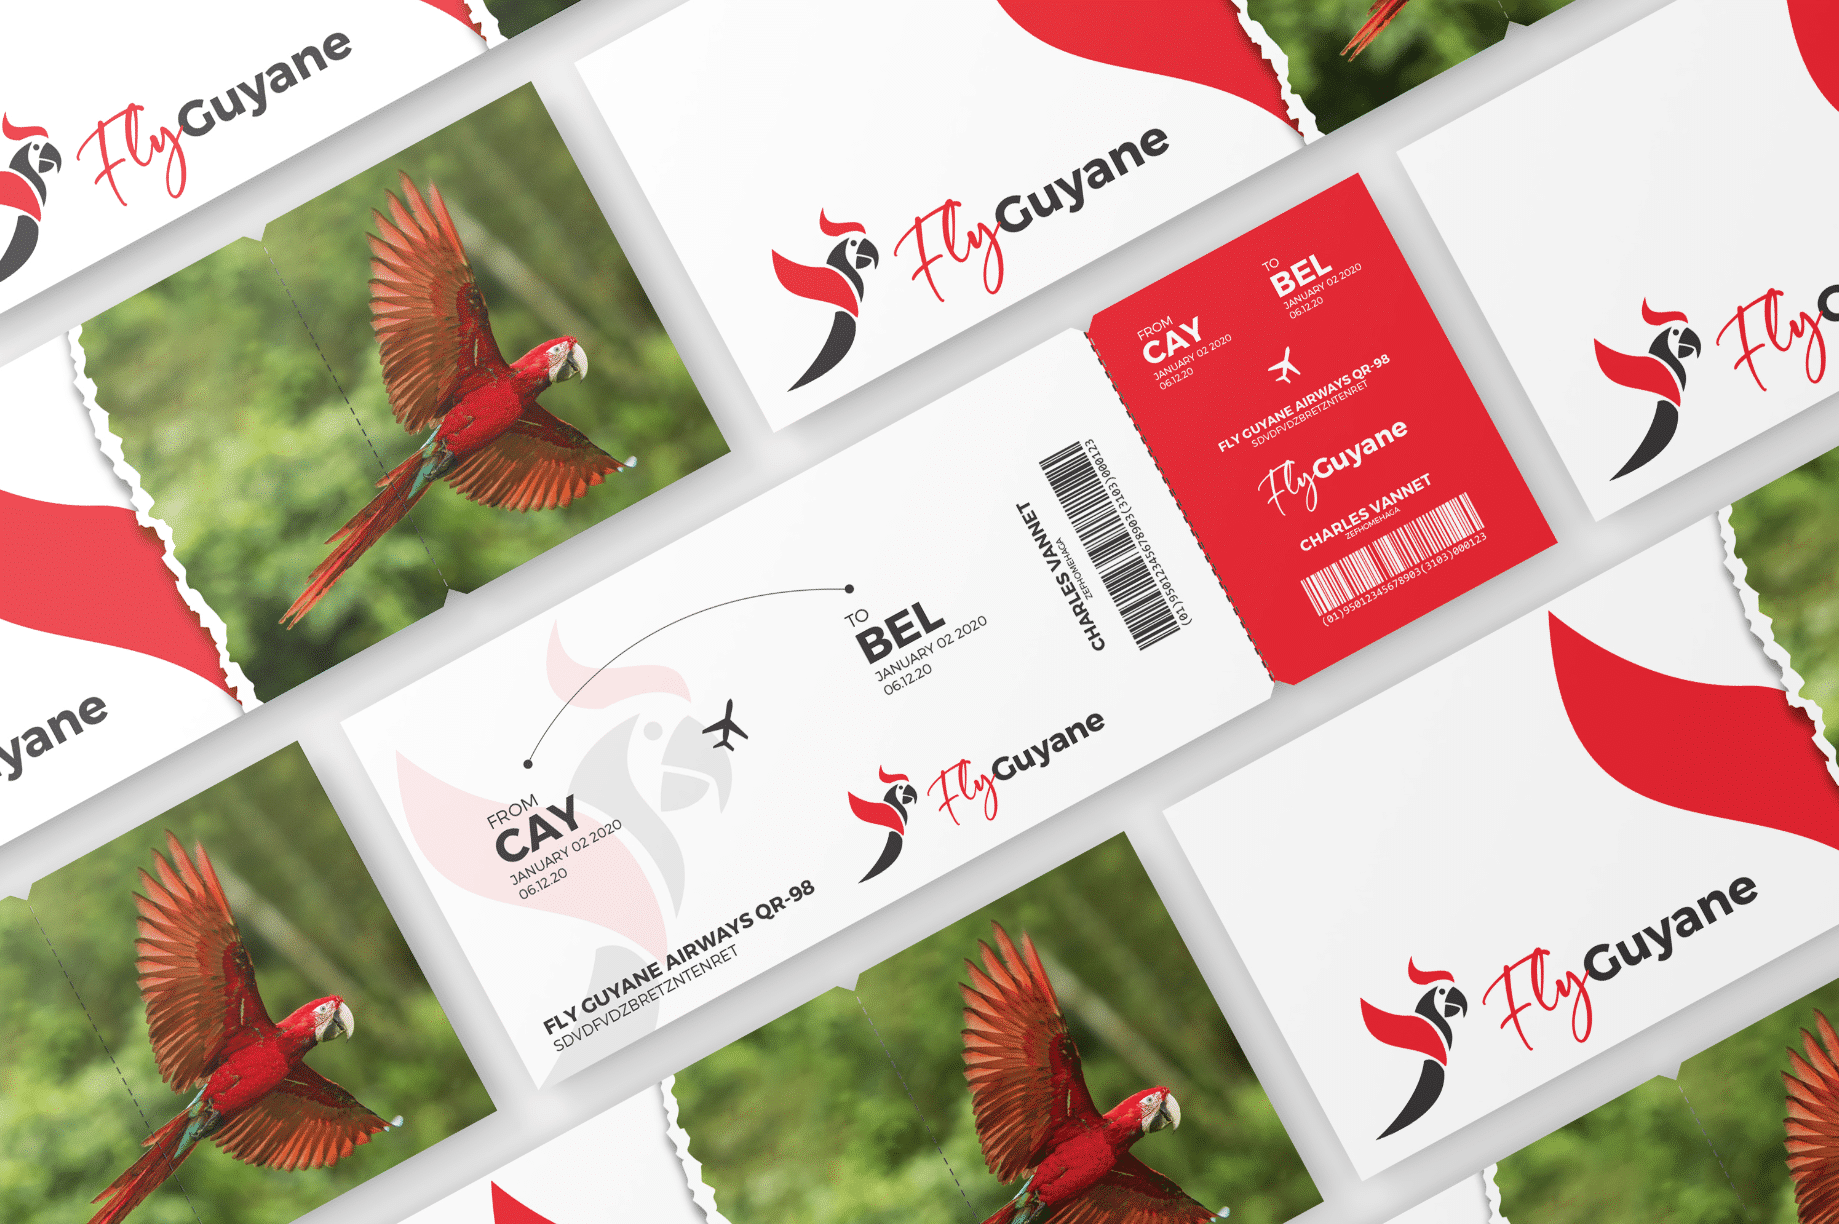 Cartes de visite Fly Guyane